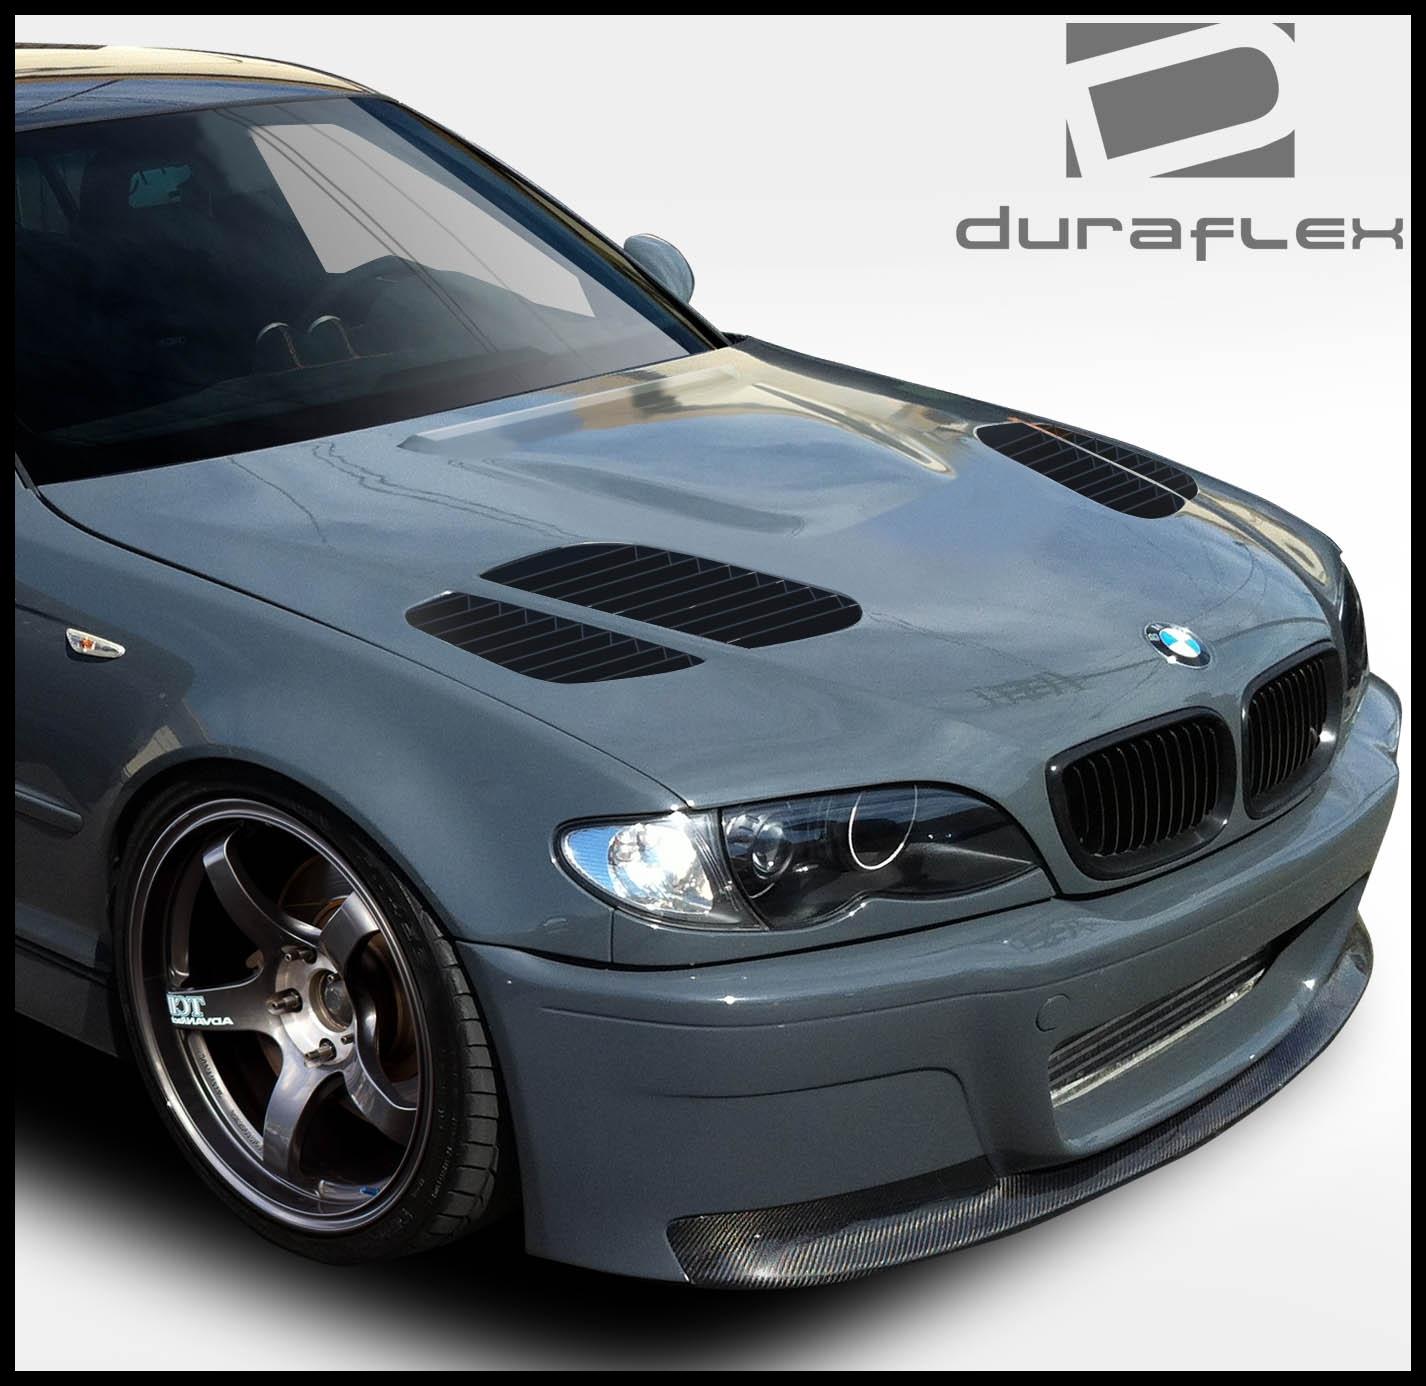 2002 2005 BMW 3 Series E46 4DR Duraflex GTR Hood 1 Piece Body Kit